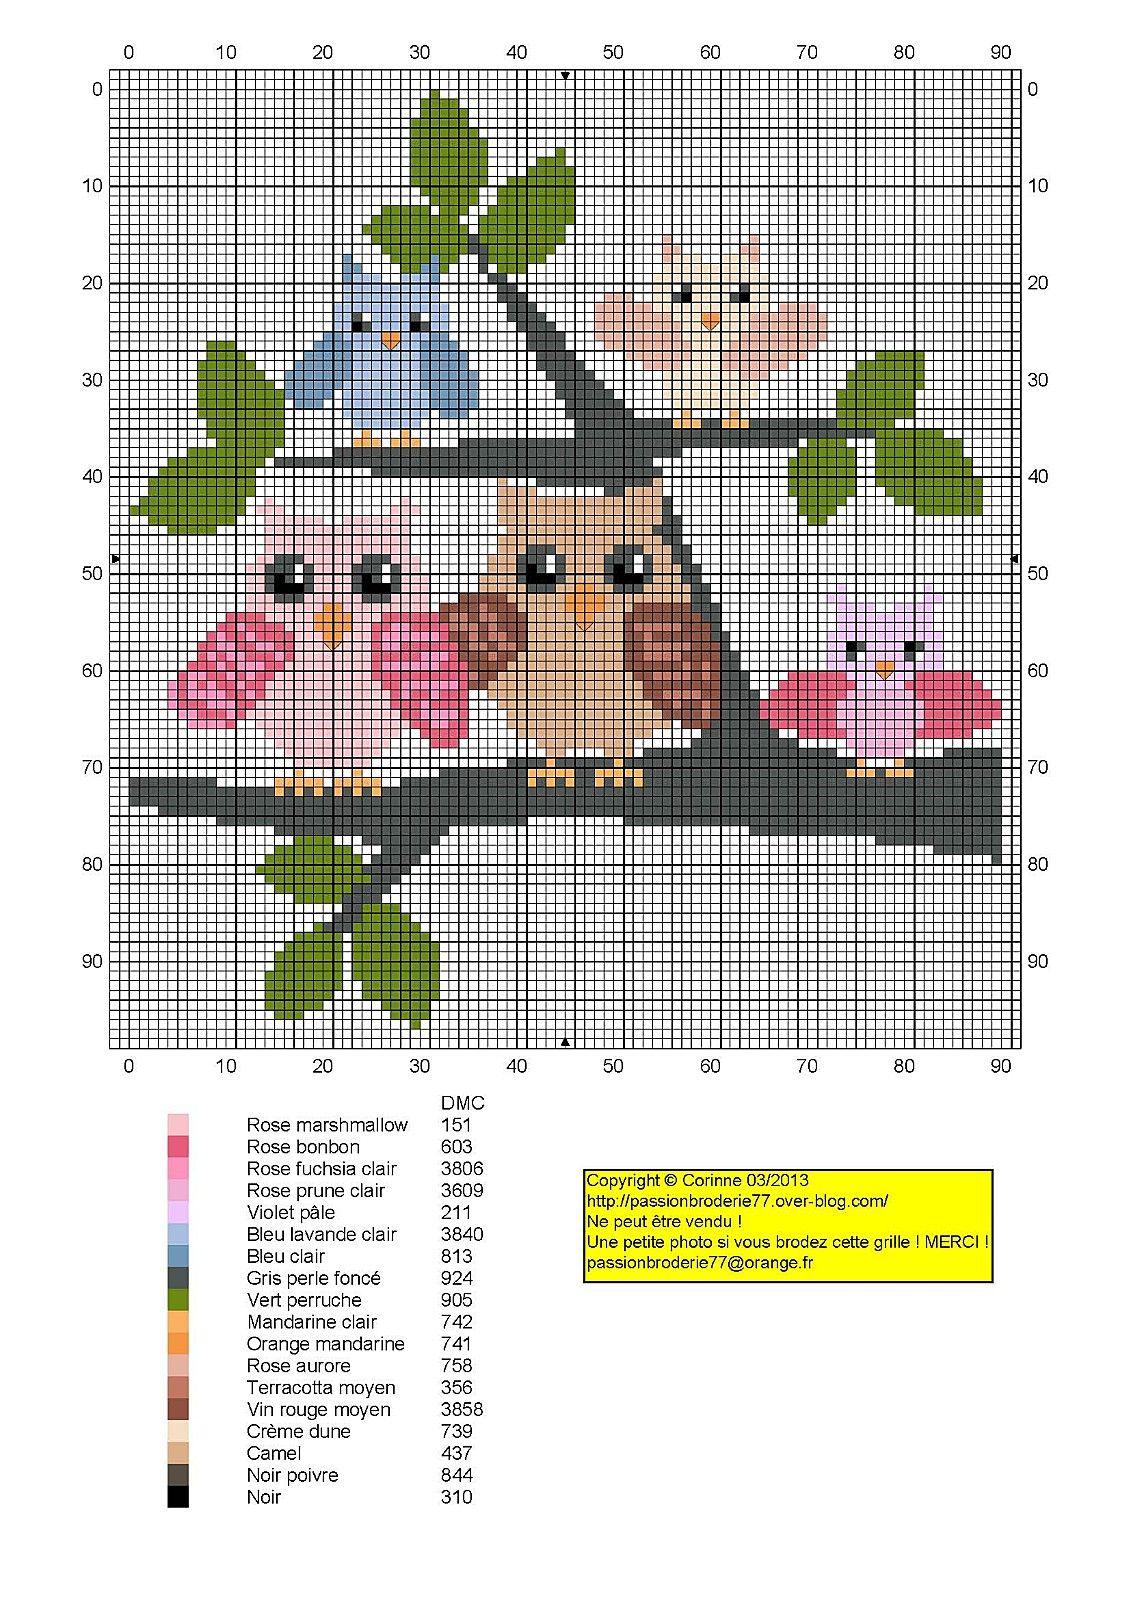 Famille chouette (Owl Family), designed by Corinne Thulmeaux, Le blog de Passionbroderie77 blogger.